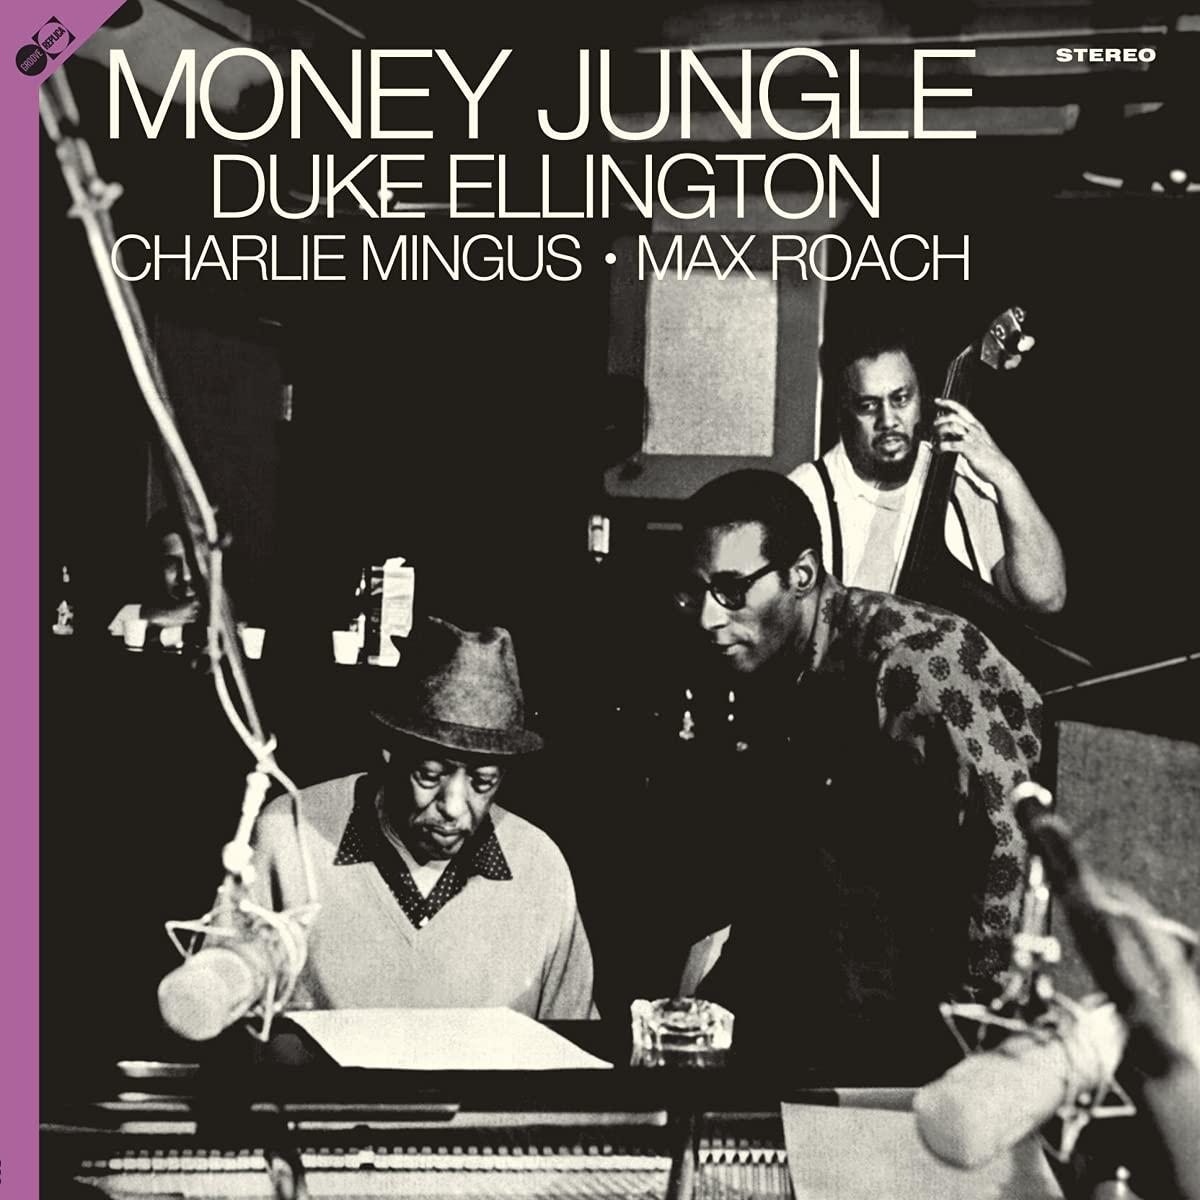 Duke Ellington, Charles Mingus & Max Roach - Money Jungle [LP]